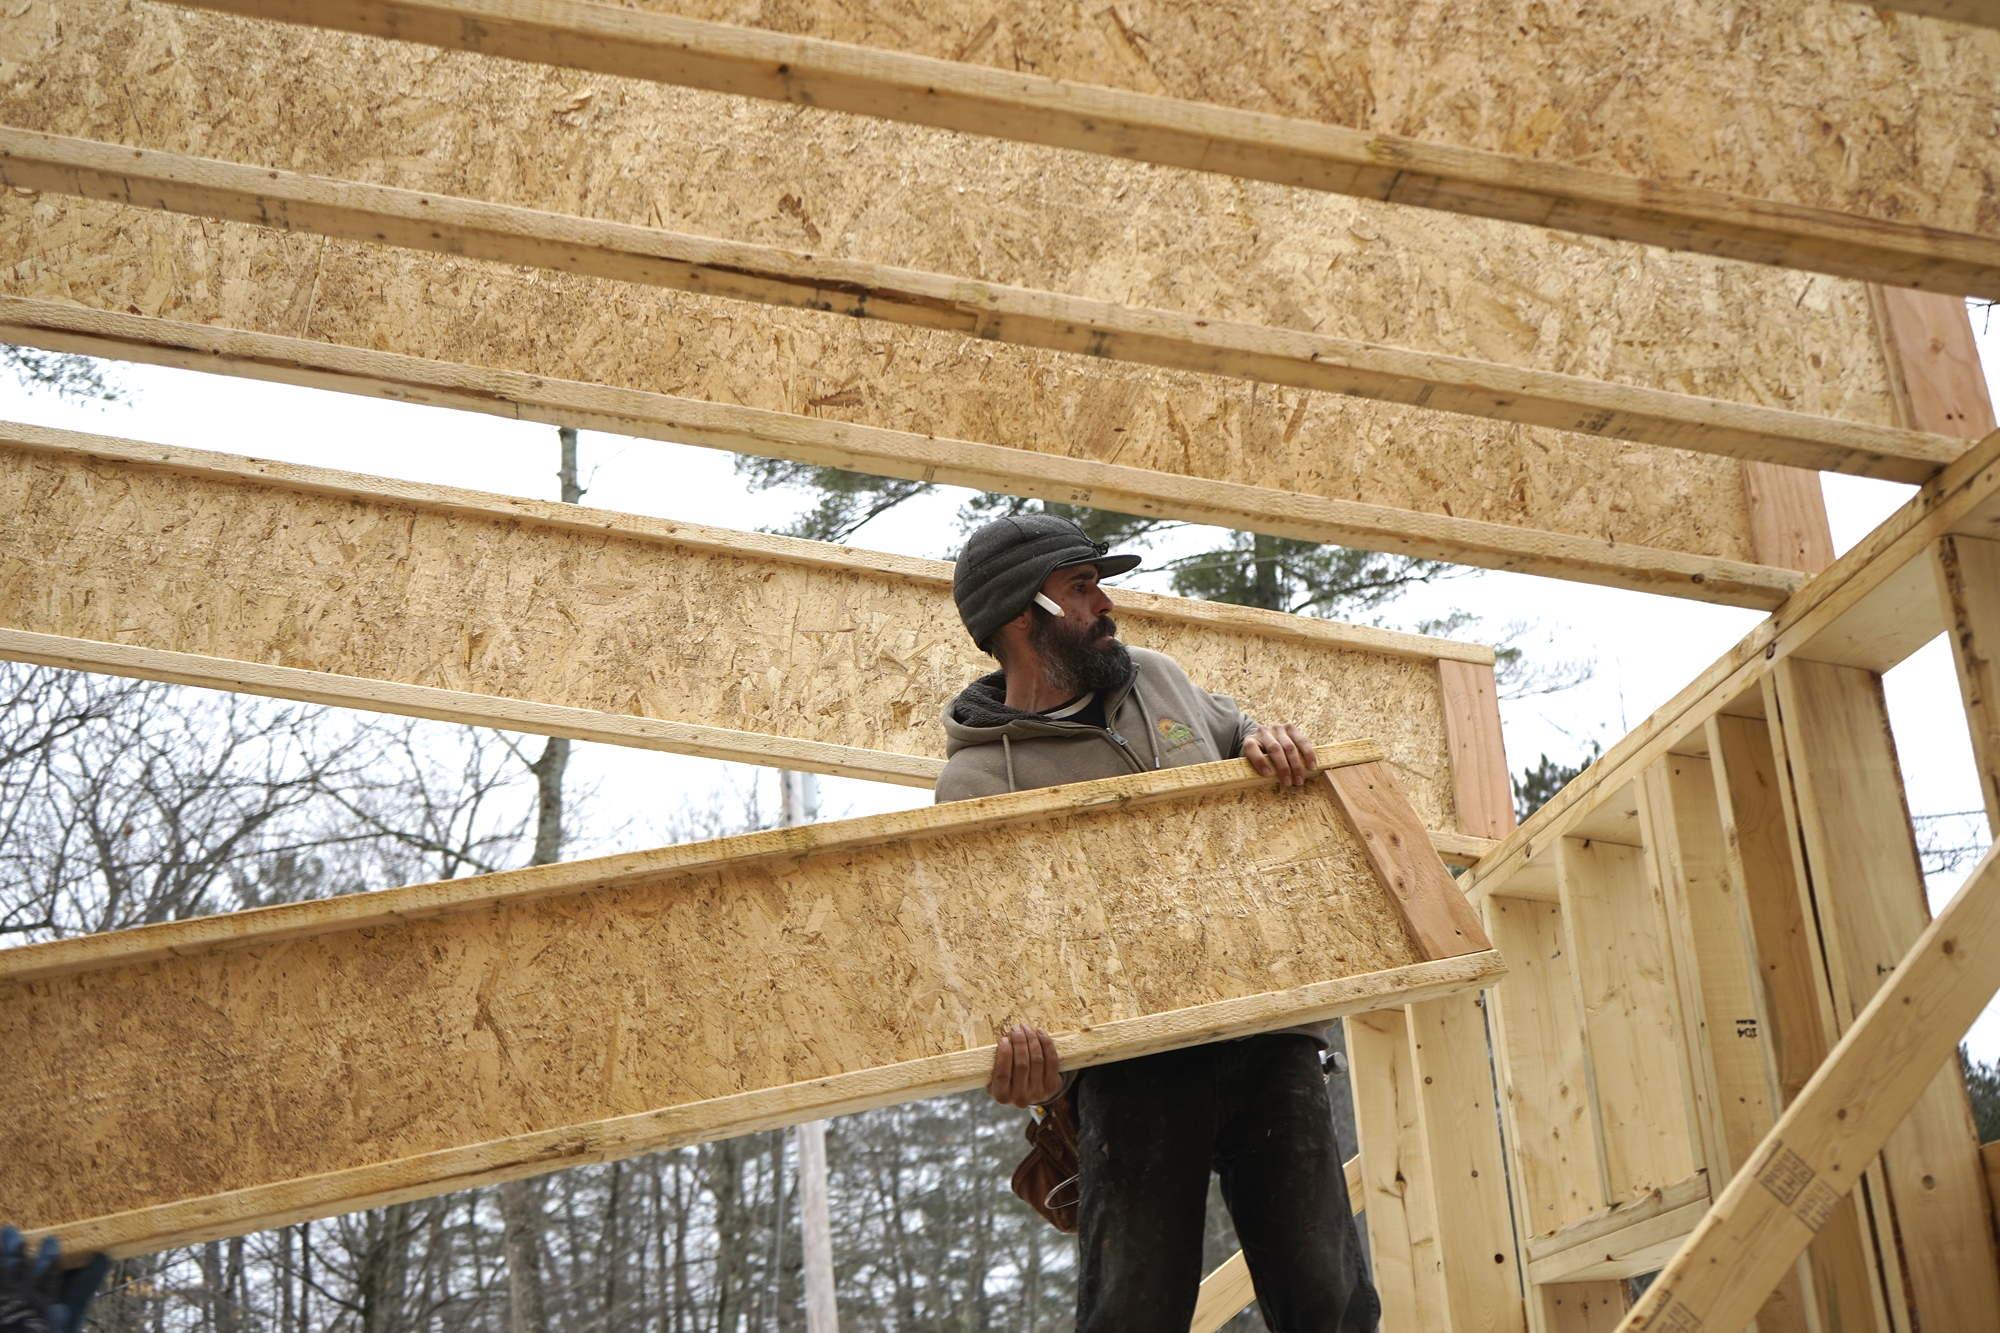 A Long Span Wood I Joist Shed Roof Jlc Online